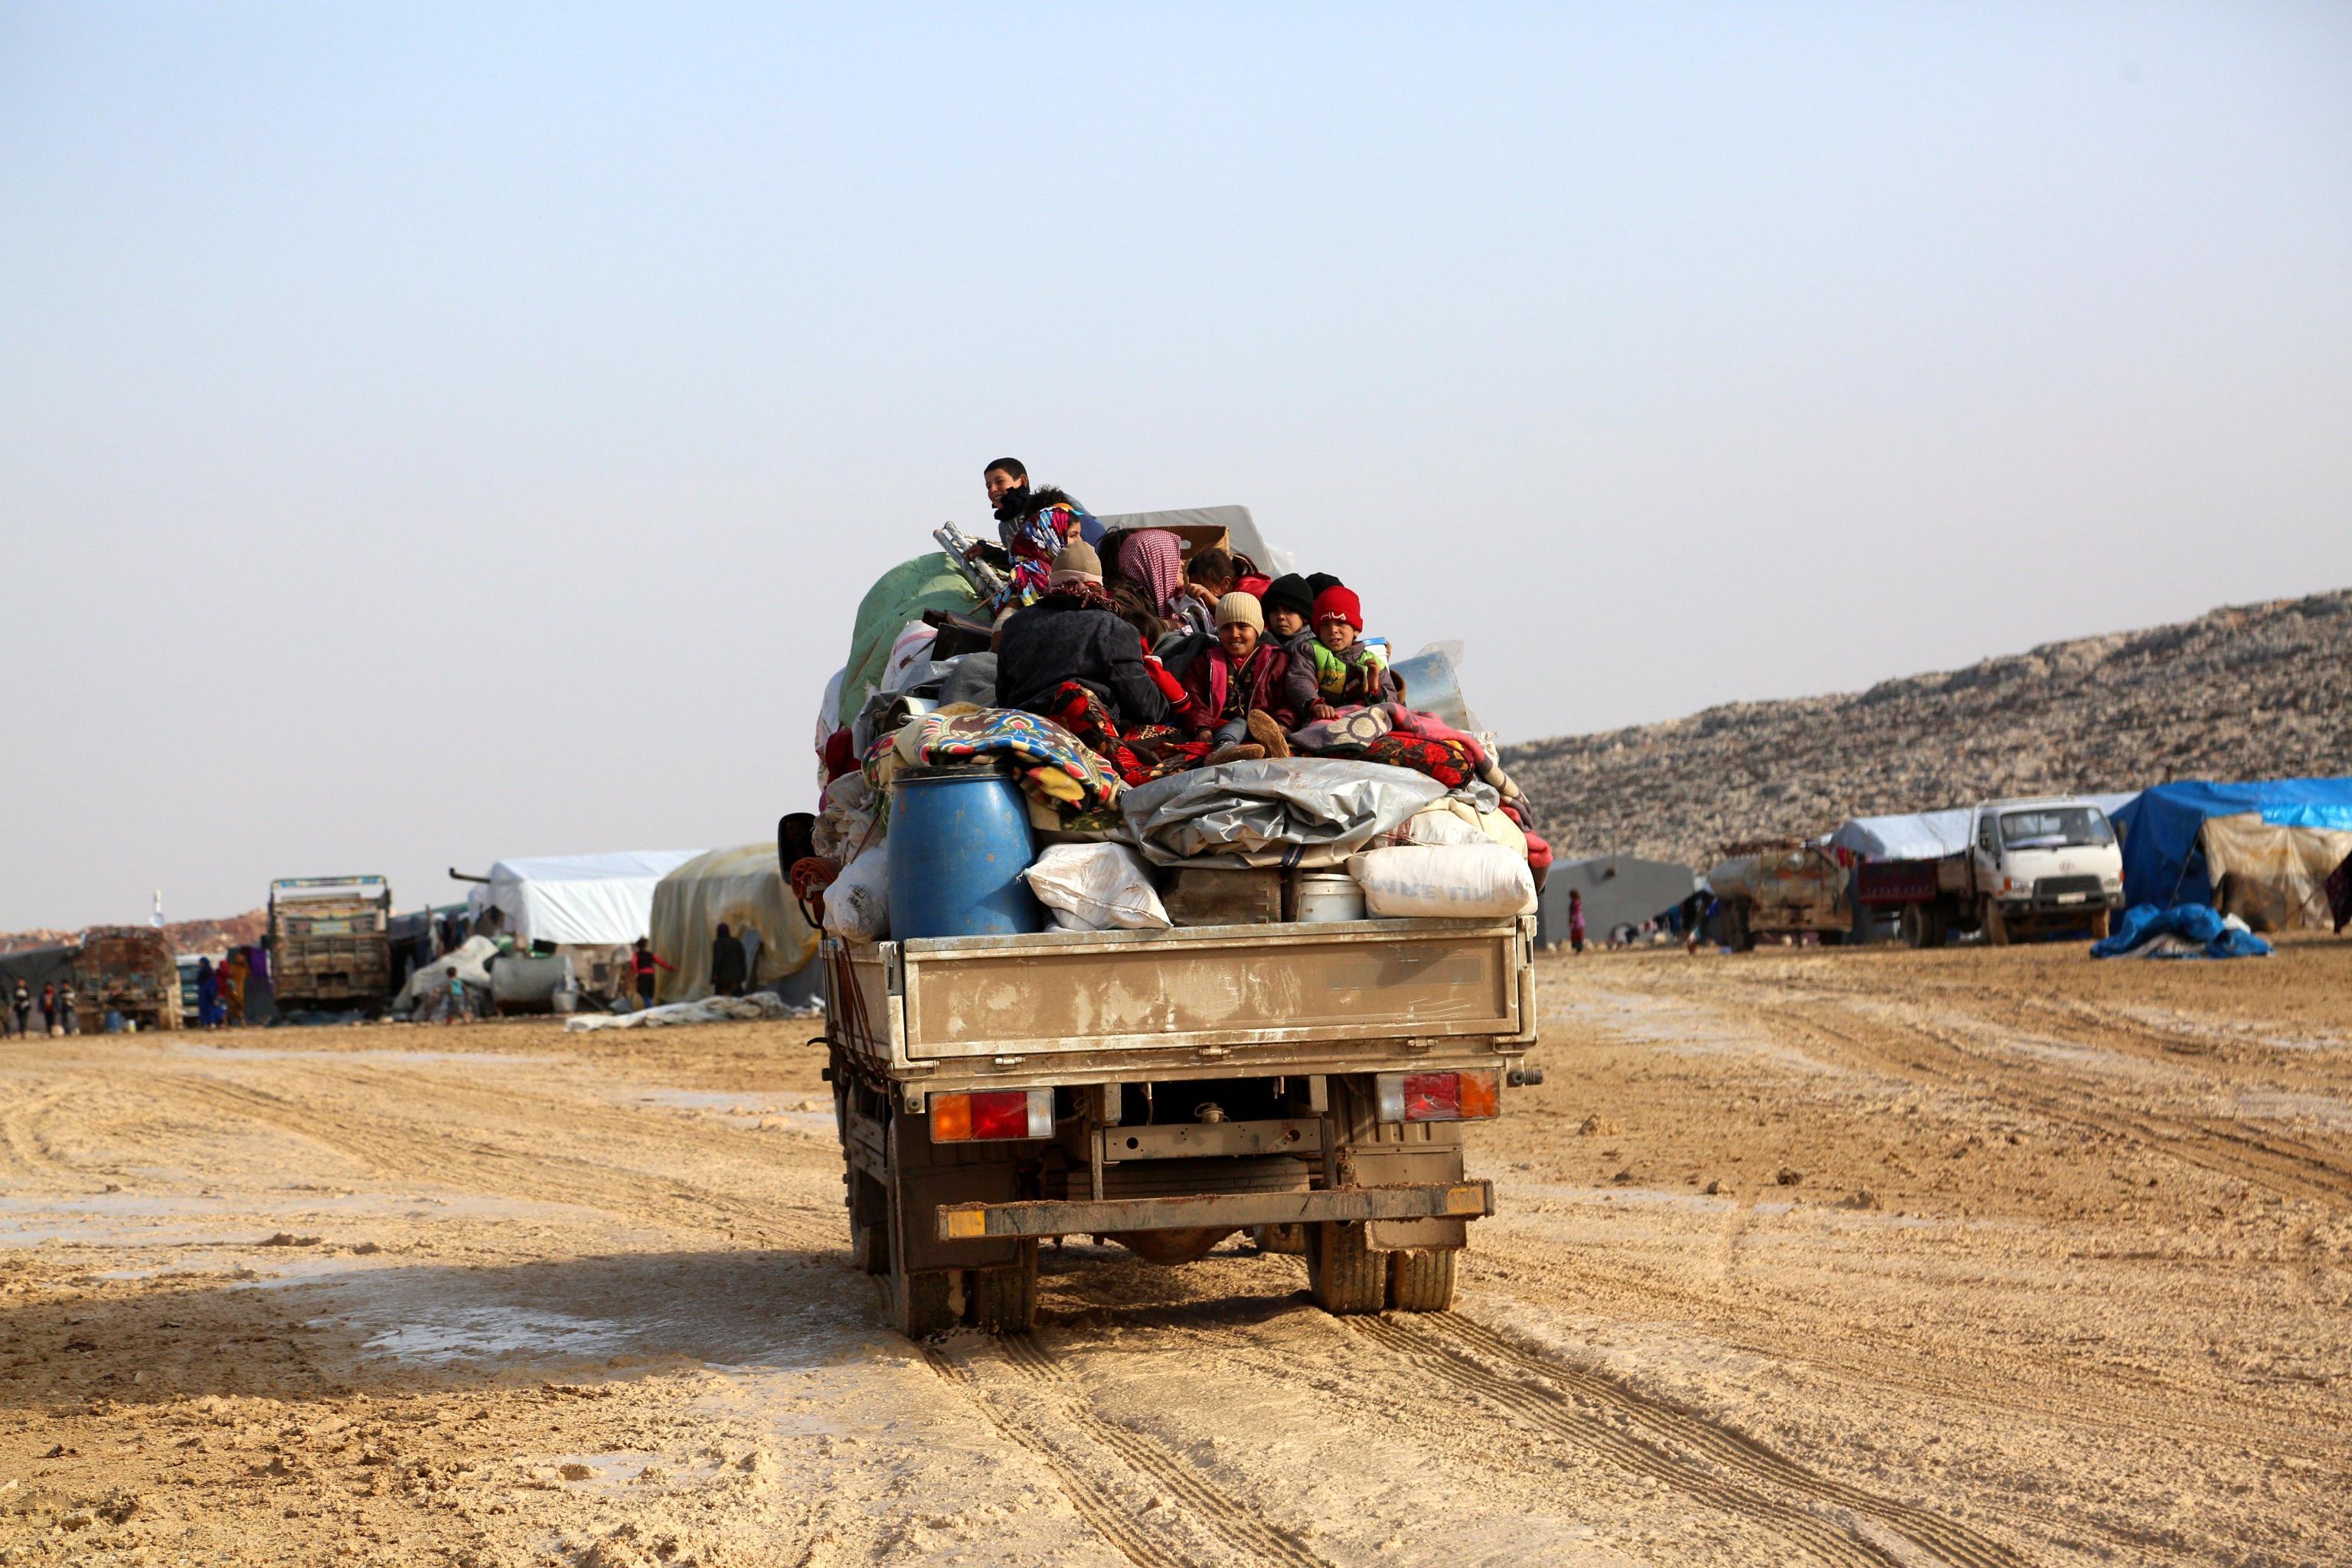 Siria: offensiva su Idlib, fuga civili